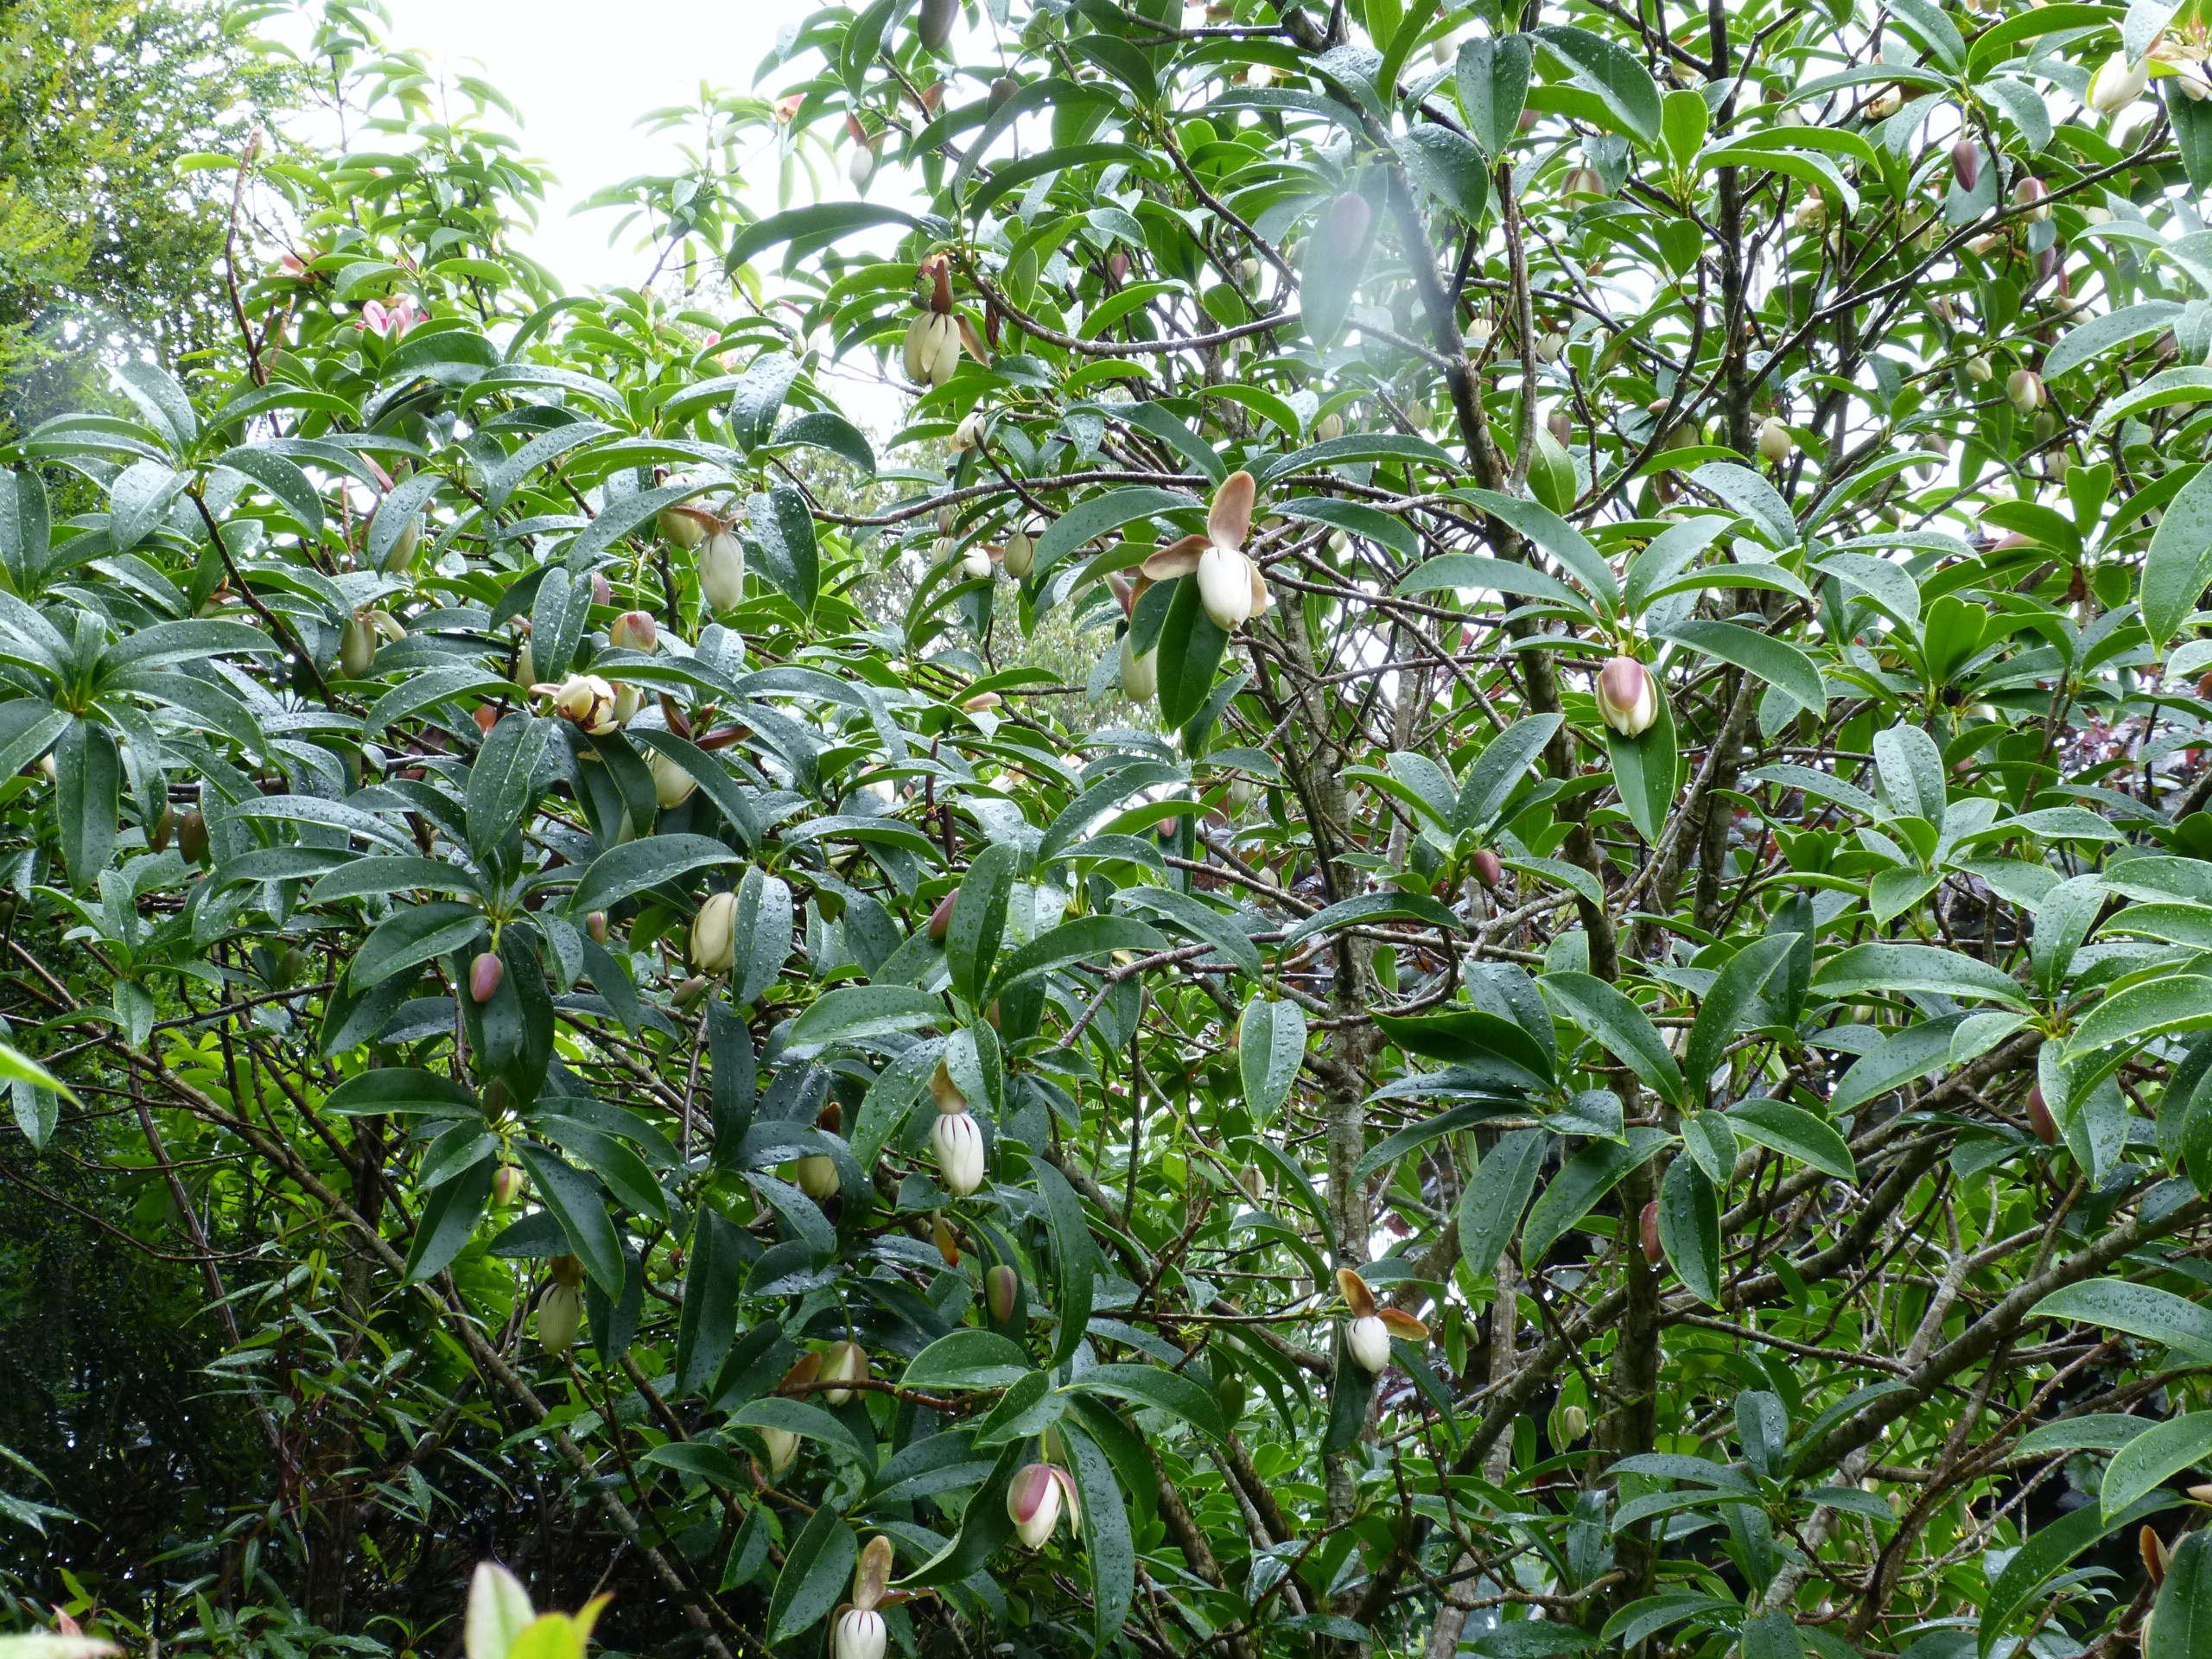 Magnolia conifera var. chingii (= Manglietia chingii) Mangli16